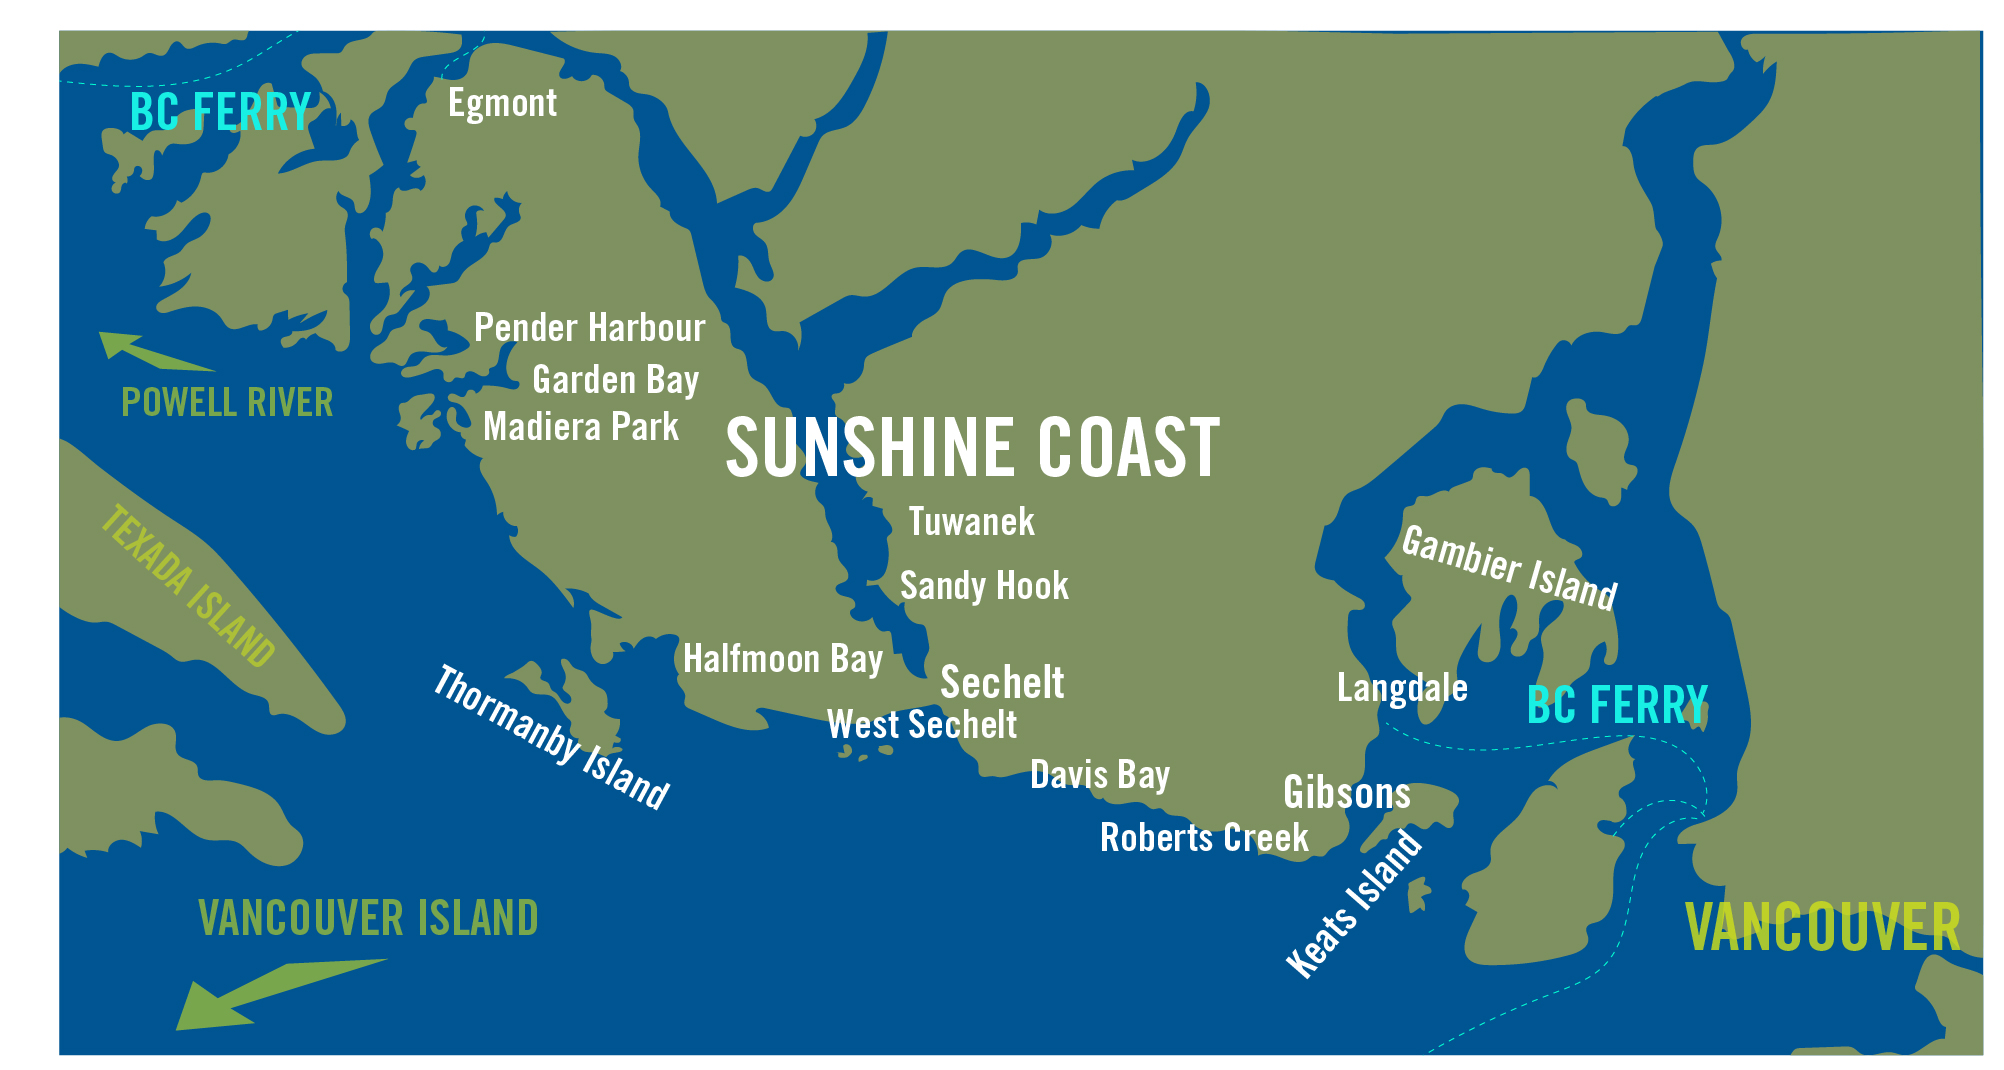 Map Sunshine Coast Bc Canada Service Area | Sunshine Coast, BC — First Response